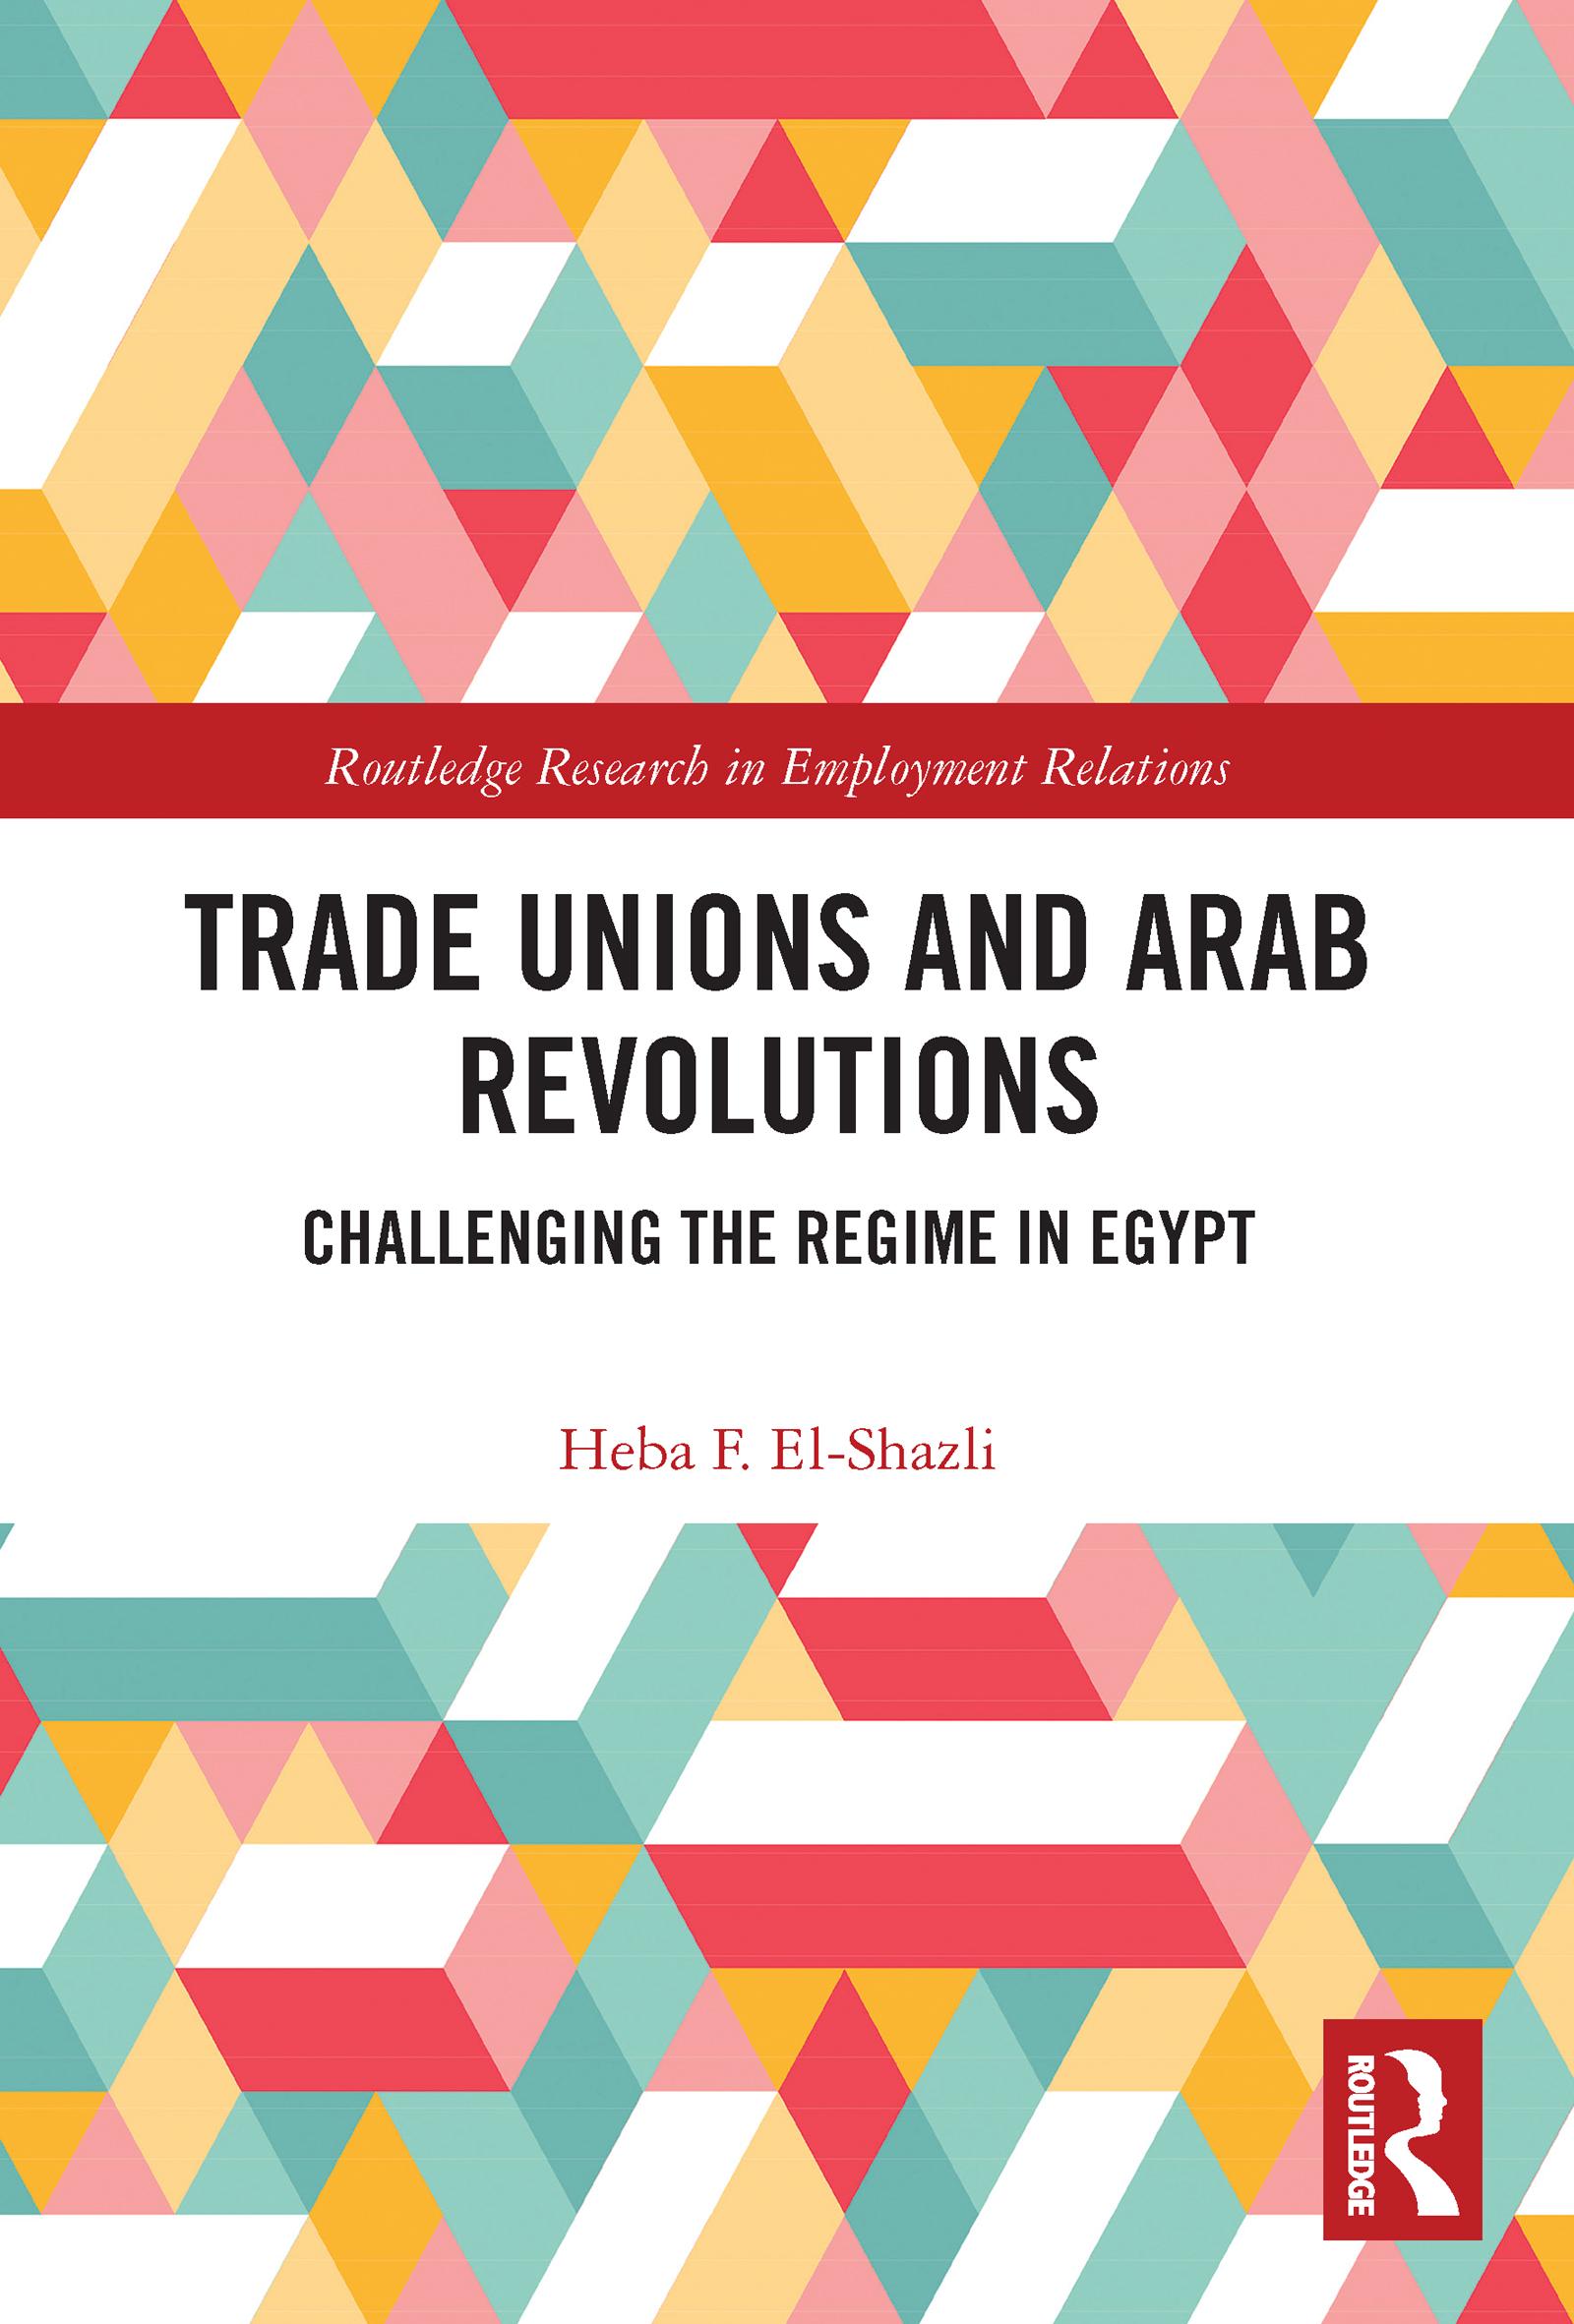 Trade Unions and Arab Revolutions